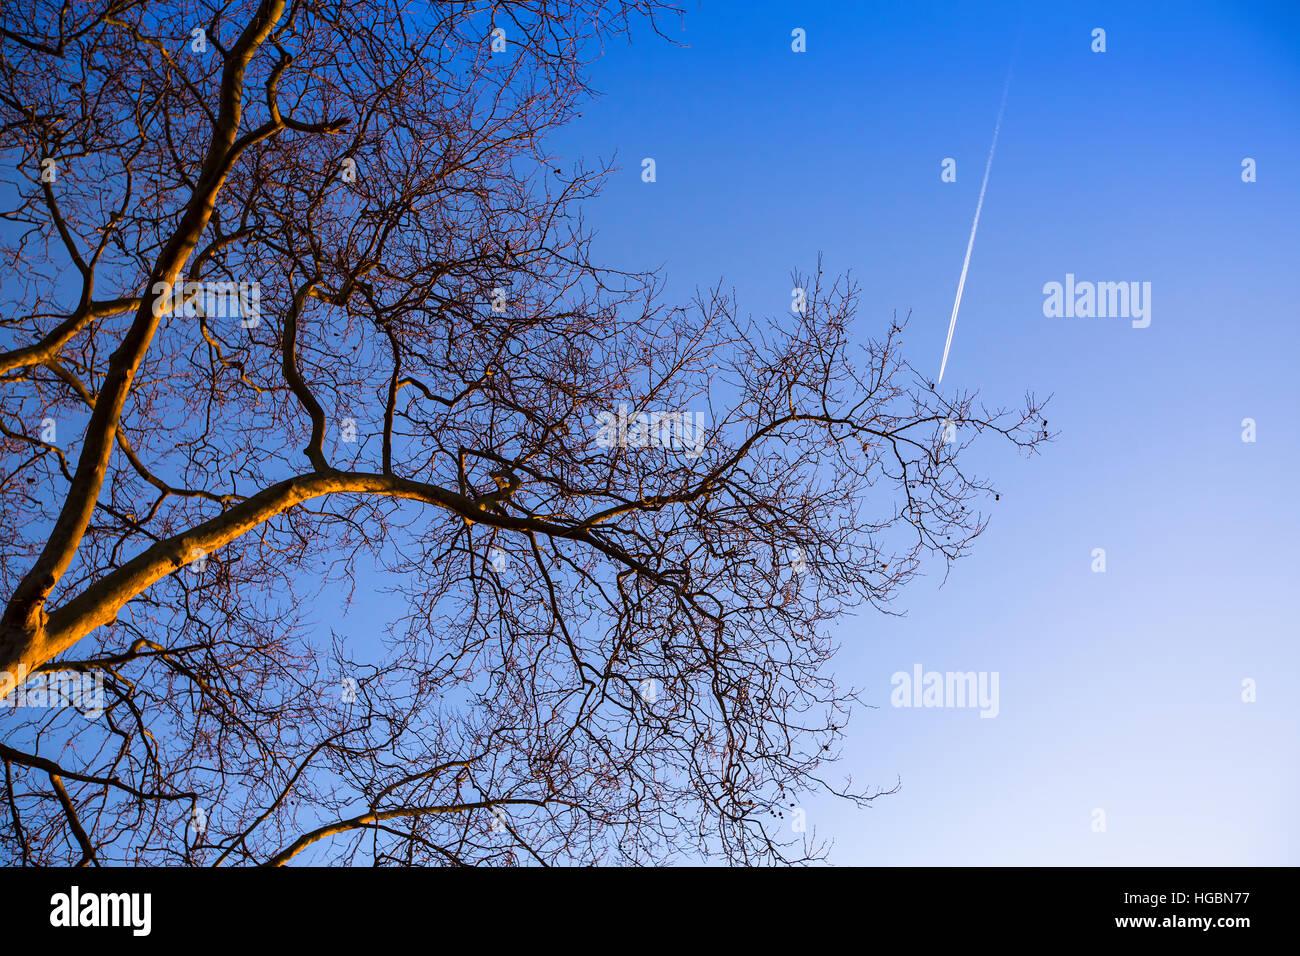 Tree branch on blue sky background. Stock Photo